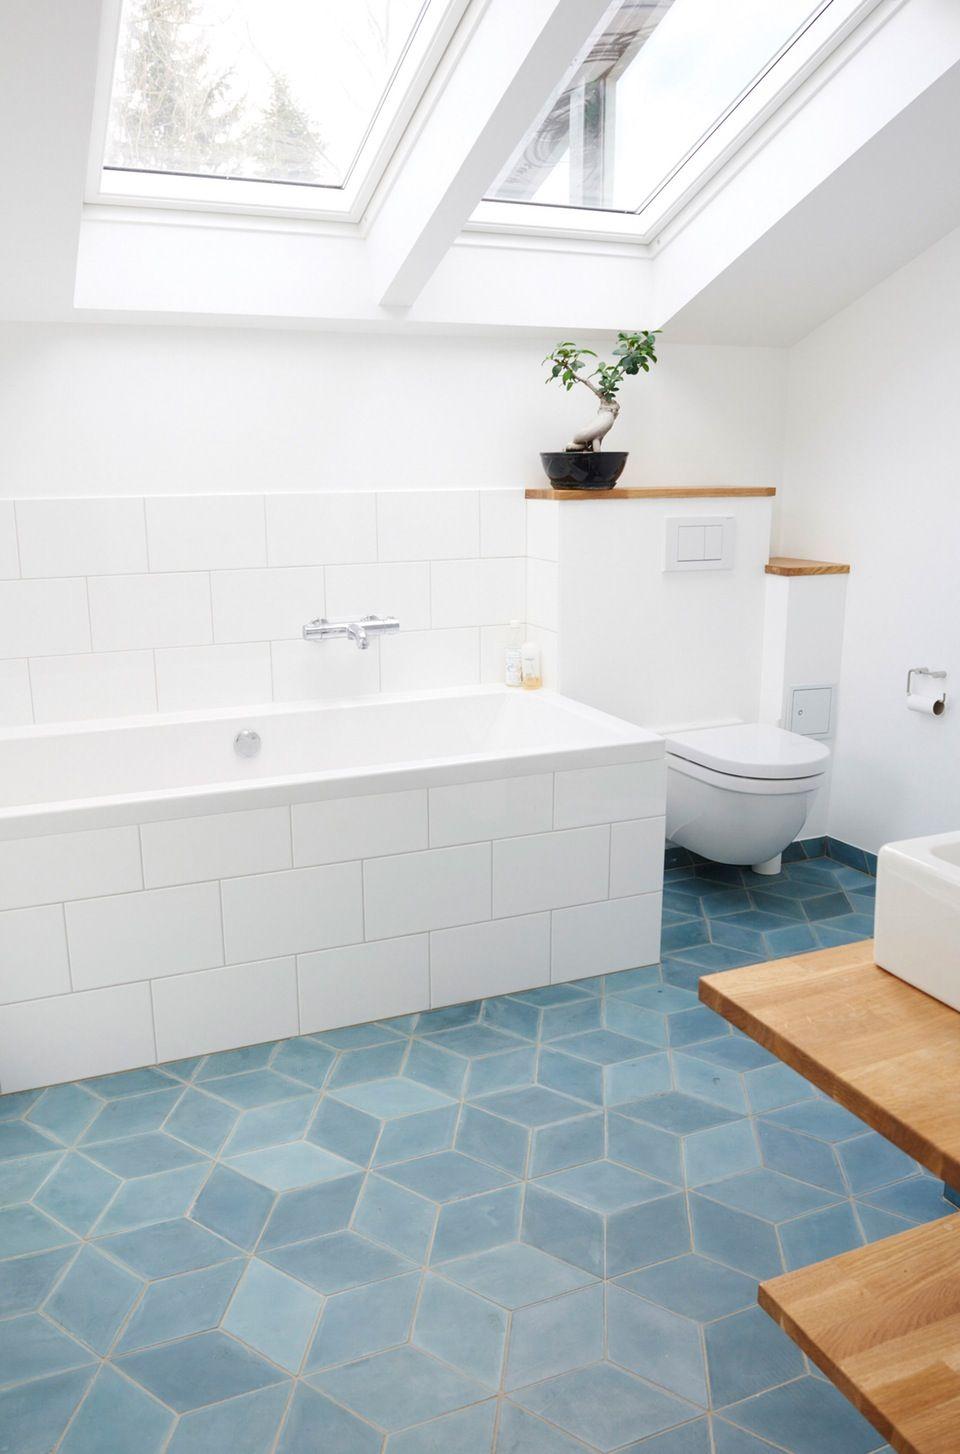 geometric tiles + lots of light/white!